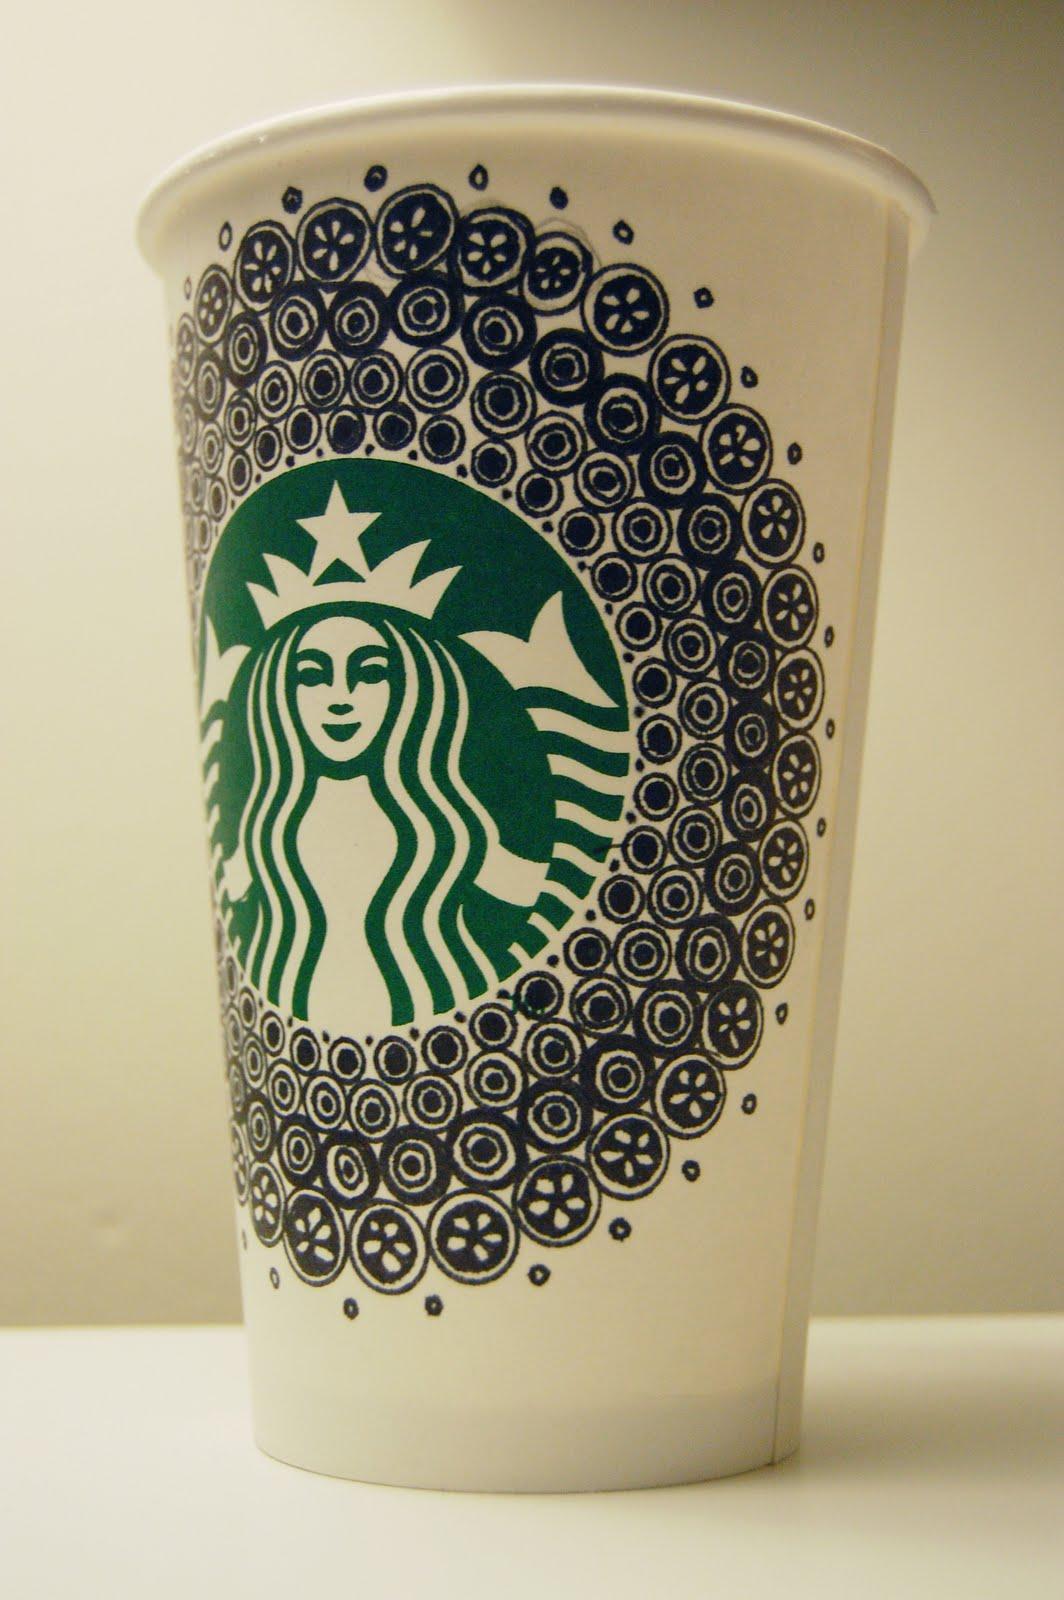 Drawn starbucks doodle Starbucks Doodler's Doodle 7 Downtown